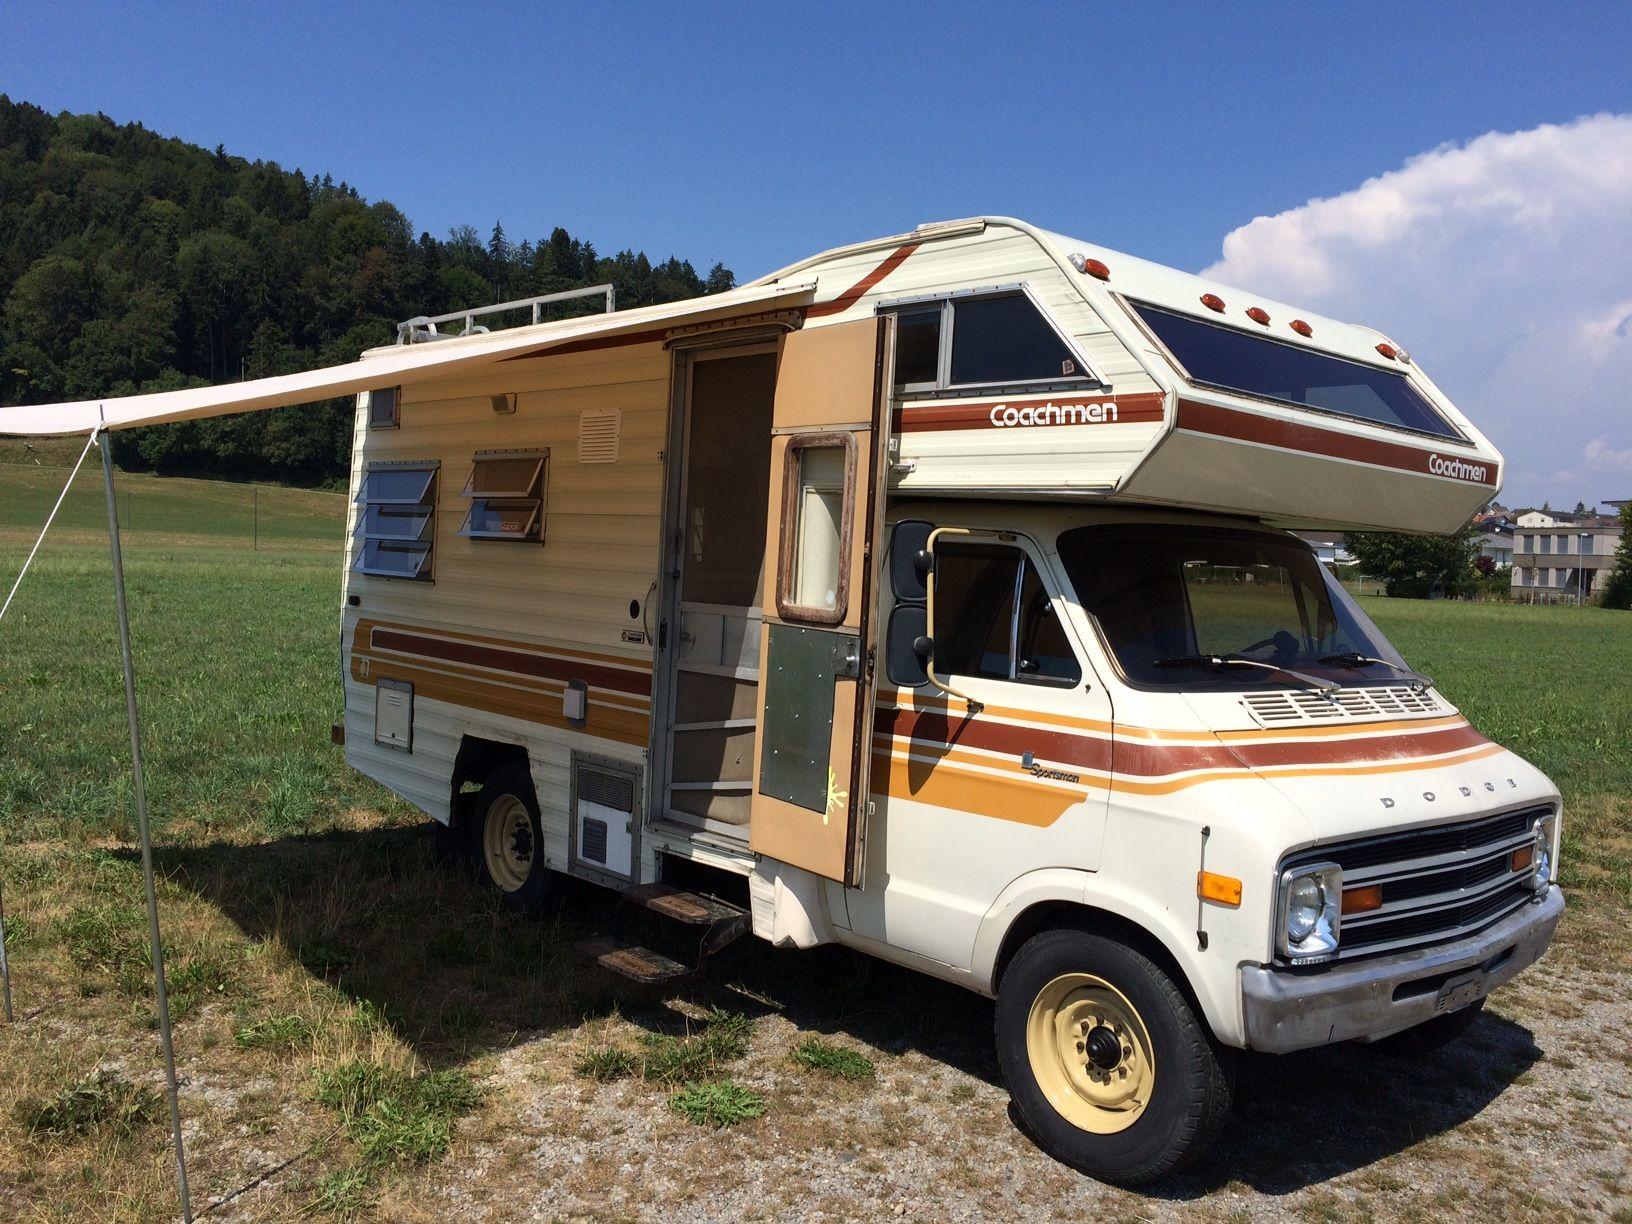 Dodge Coachmen 1978 5 9 L 360cui Originalzustand Vintage Camper Rv Trailers Suv Camper